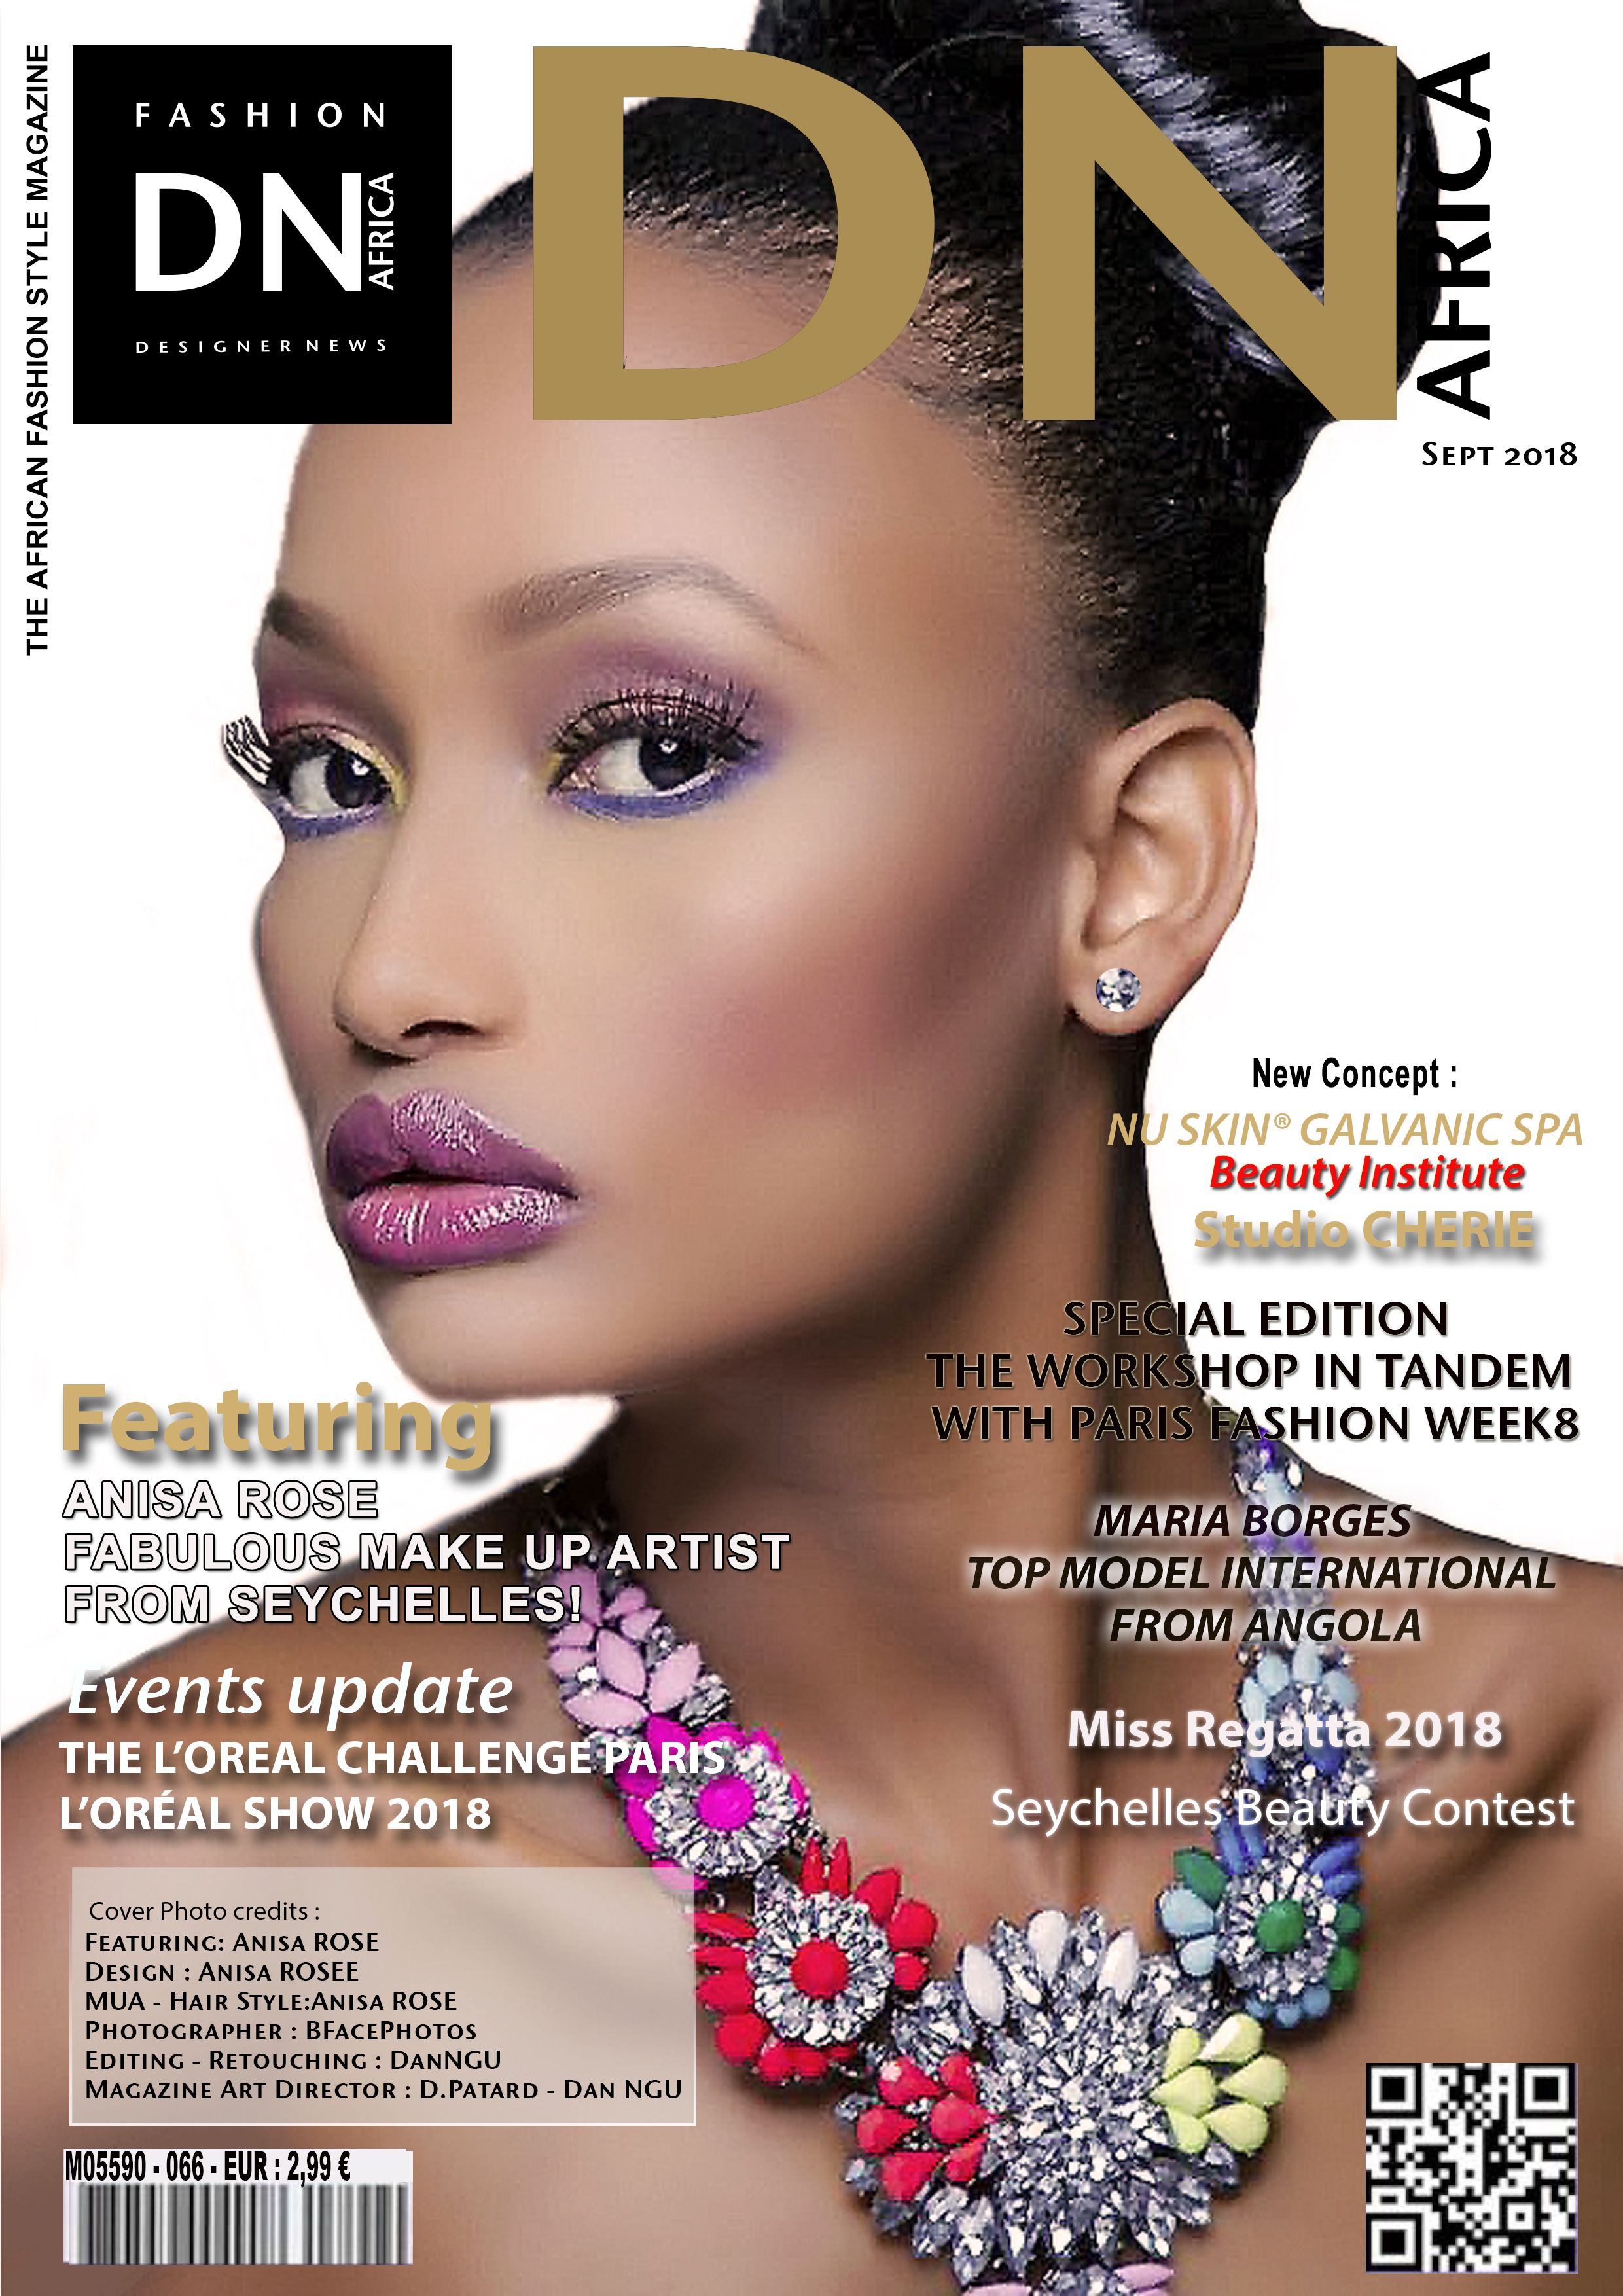 DNAFRICA-Cover-SEPT-2018-Mag-Number-66-Anisa-Rose-